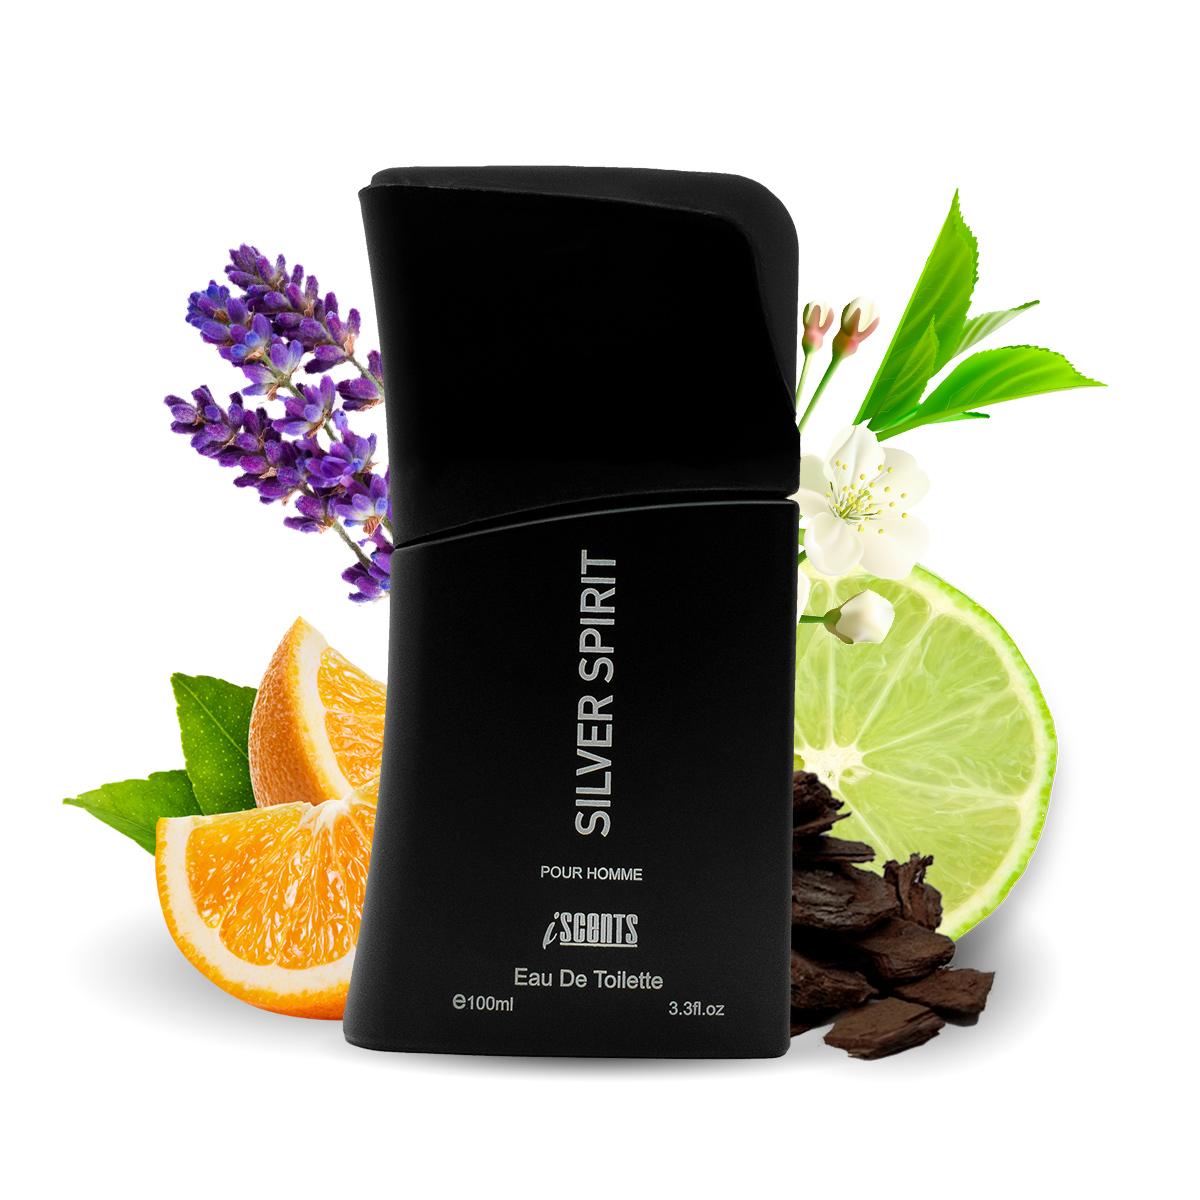 Kit 2 Perfumes Importados Noir Gem e Silver Spirit I Scents